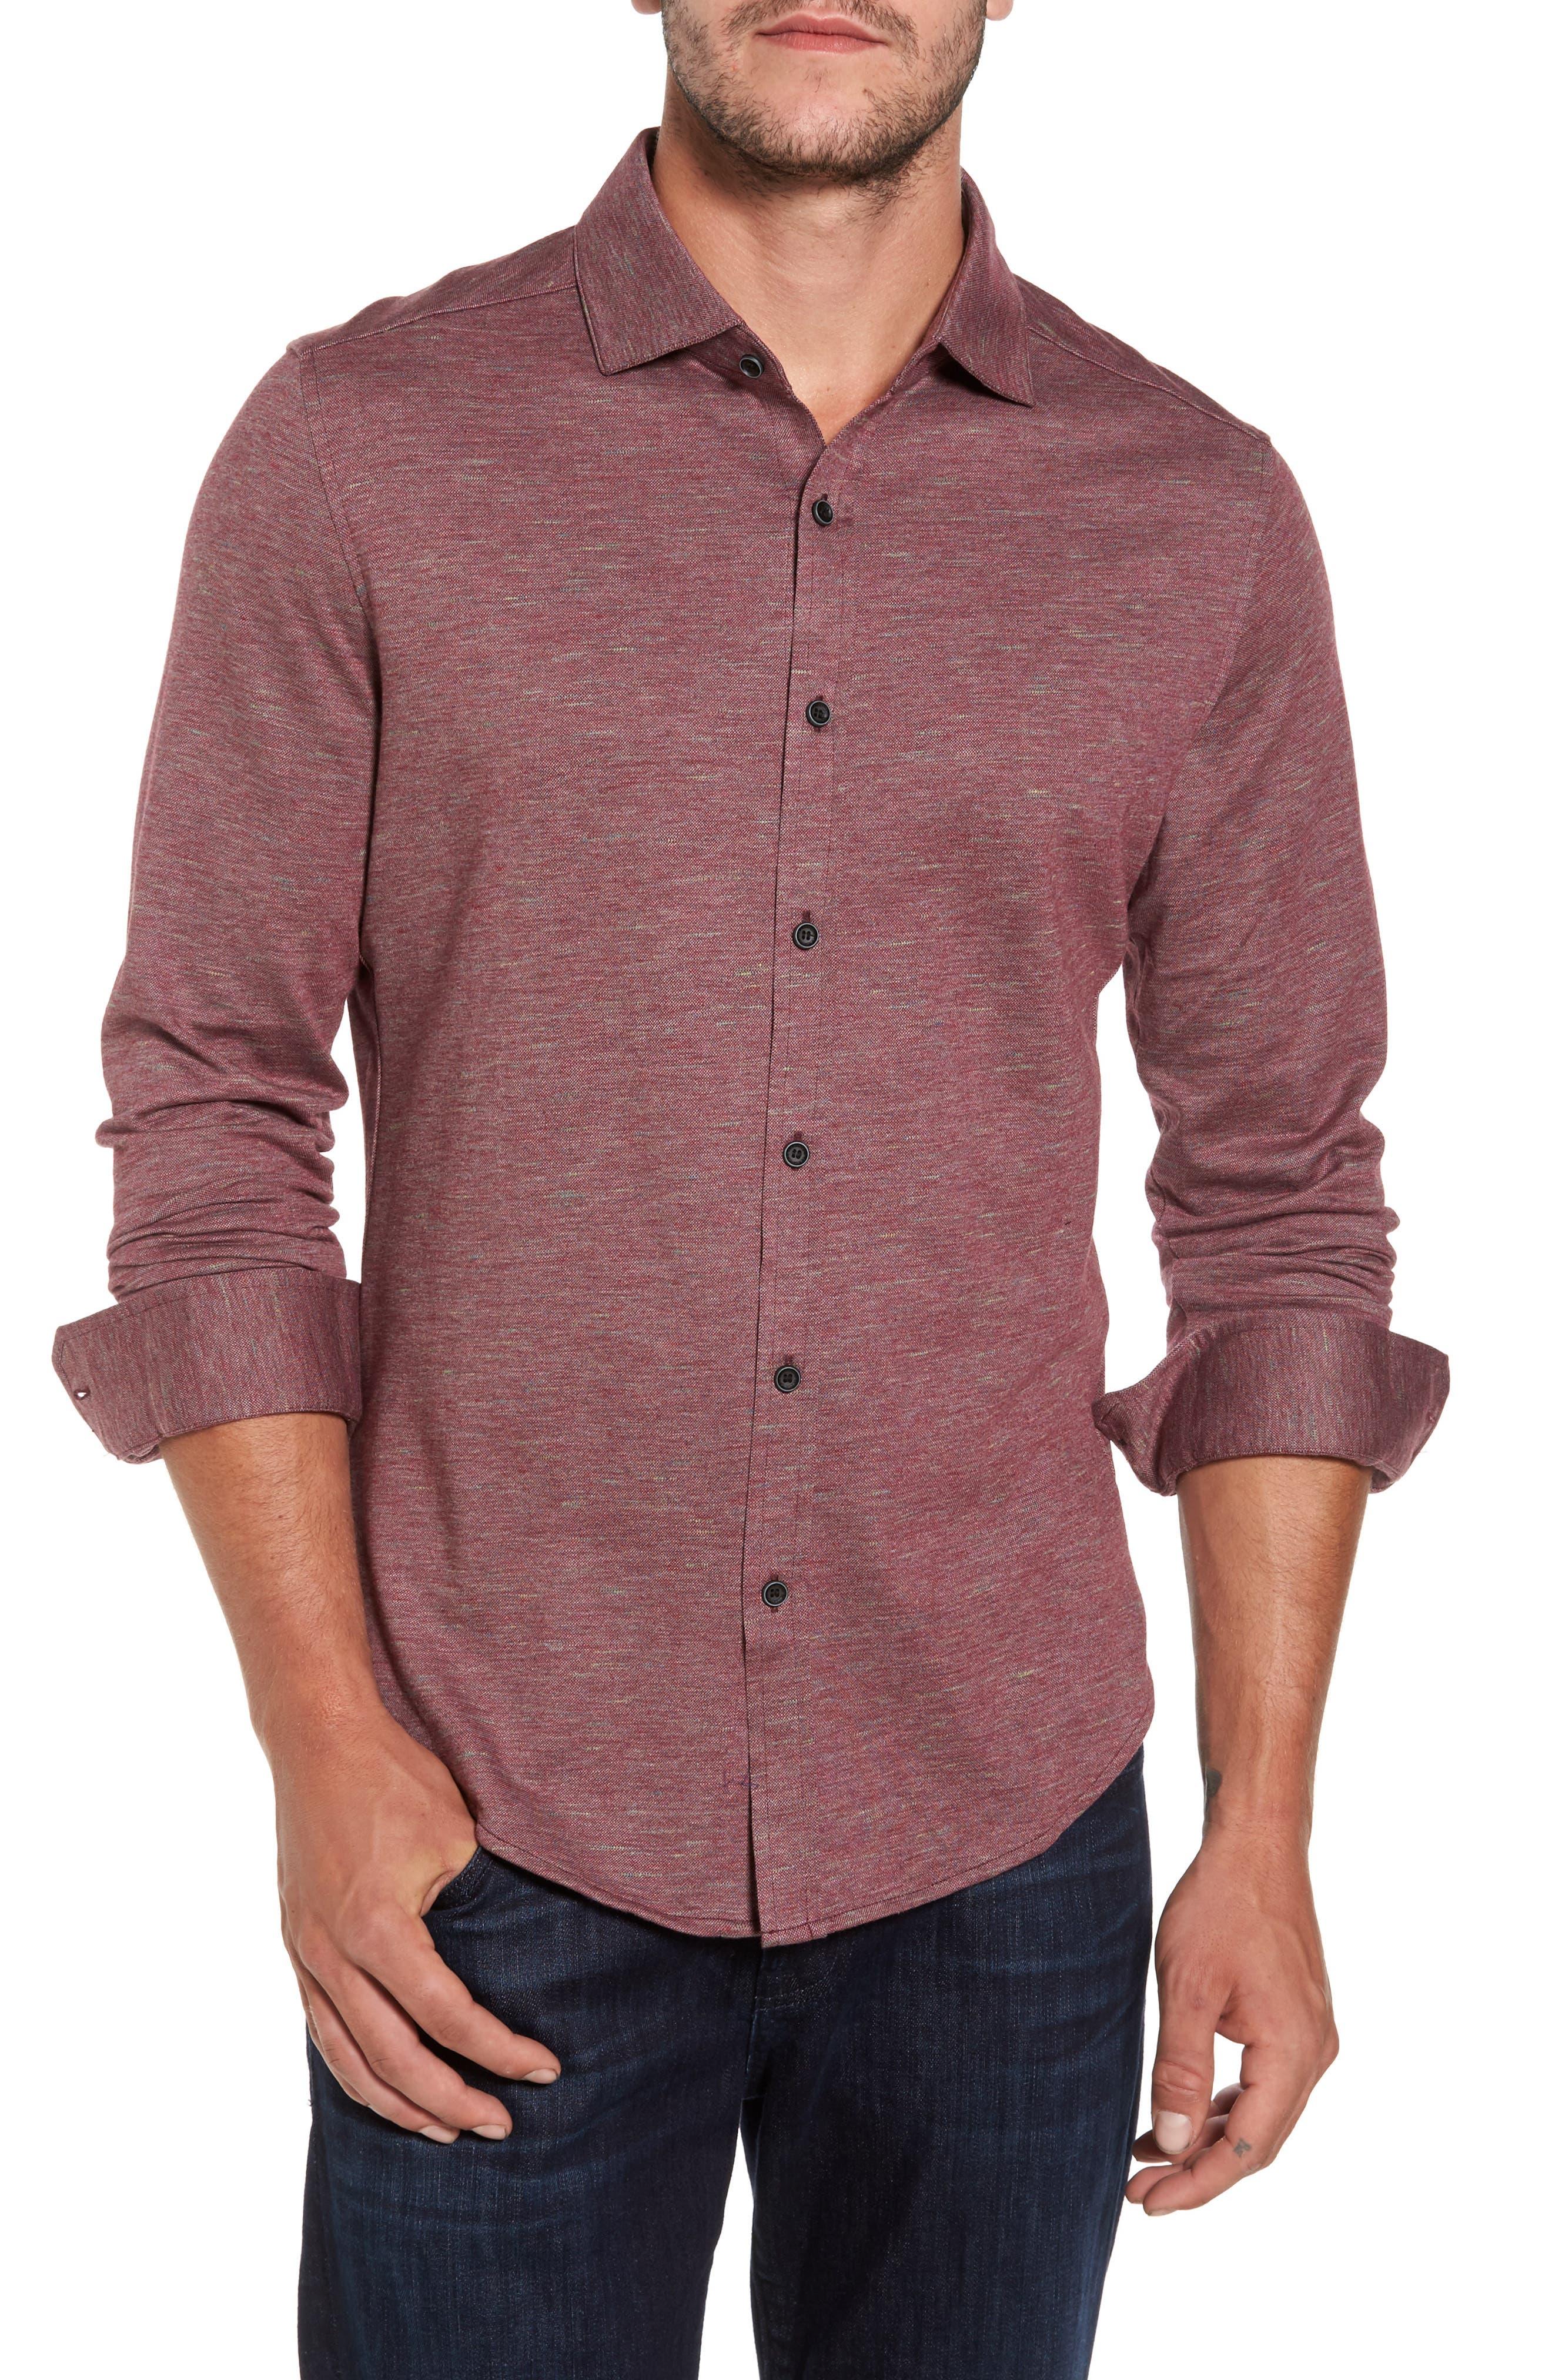 Alternate Image 1 Selected - Bugatchi Regular Fit Piqué Knit Sport Shirt